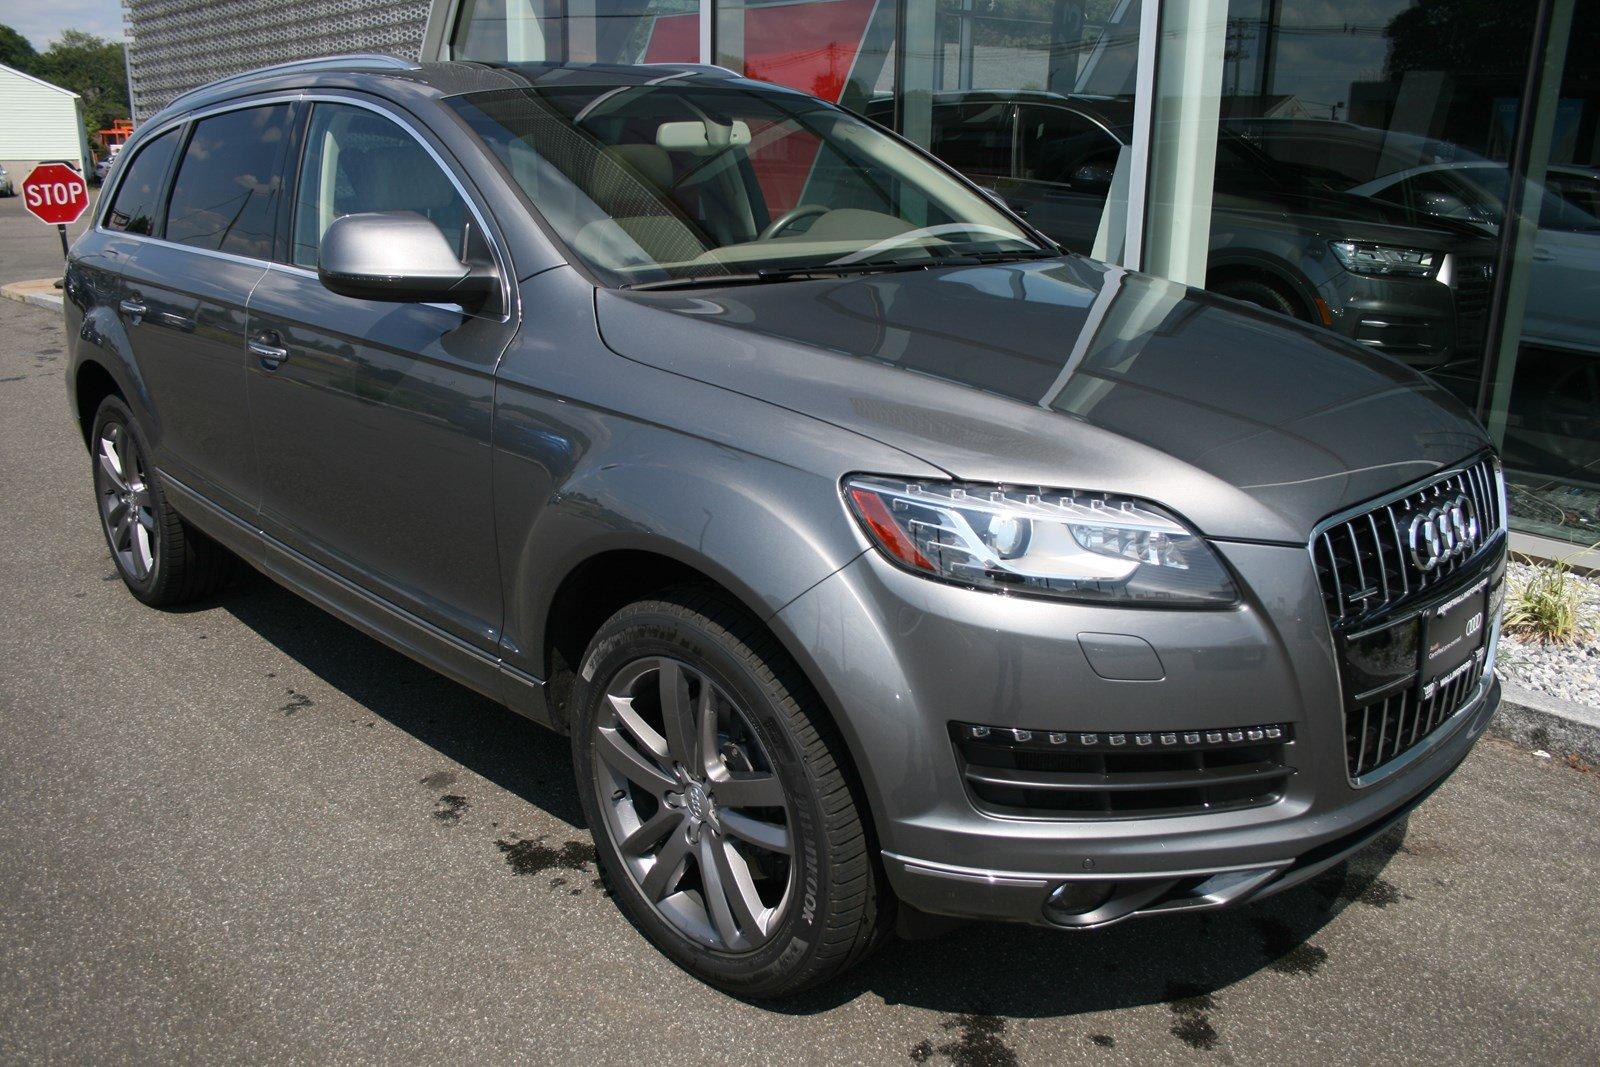 Audi Of Wallingford Vehicles For Sale In Wallingford CT - Audi wallingford